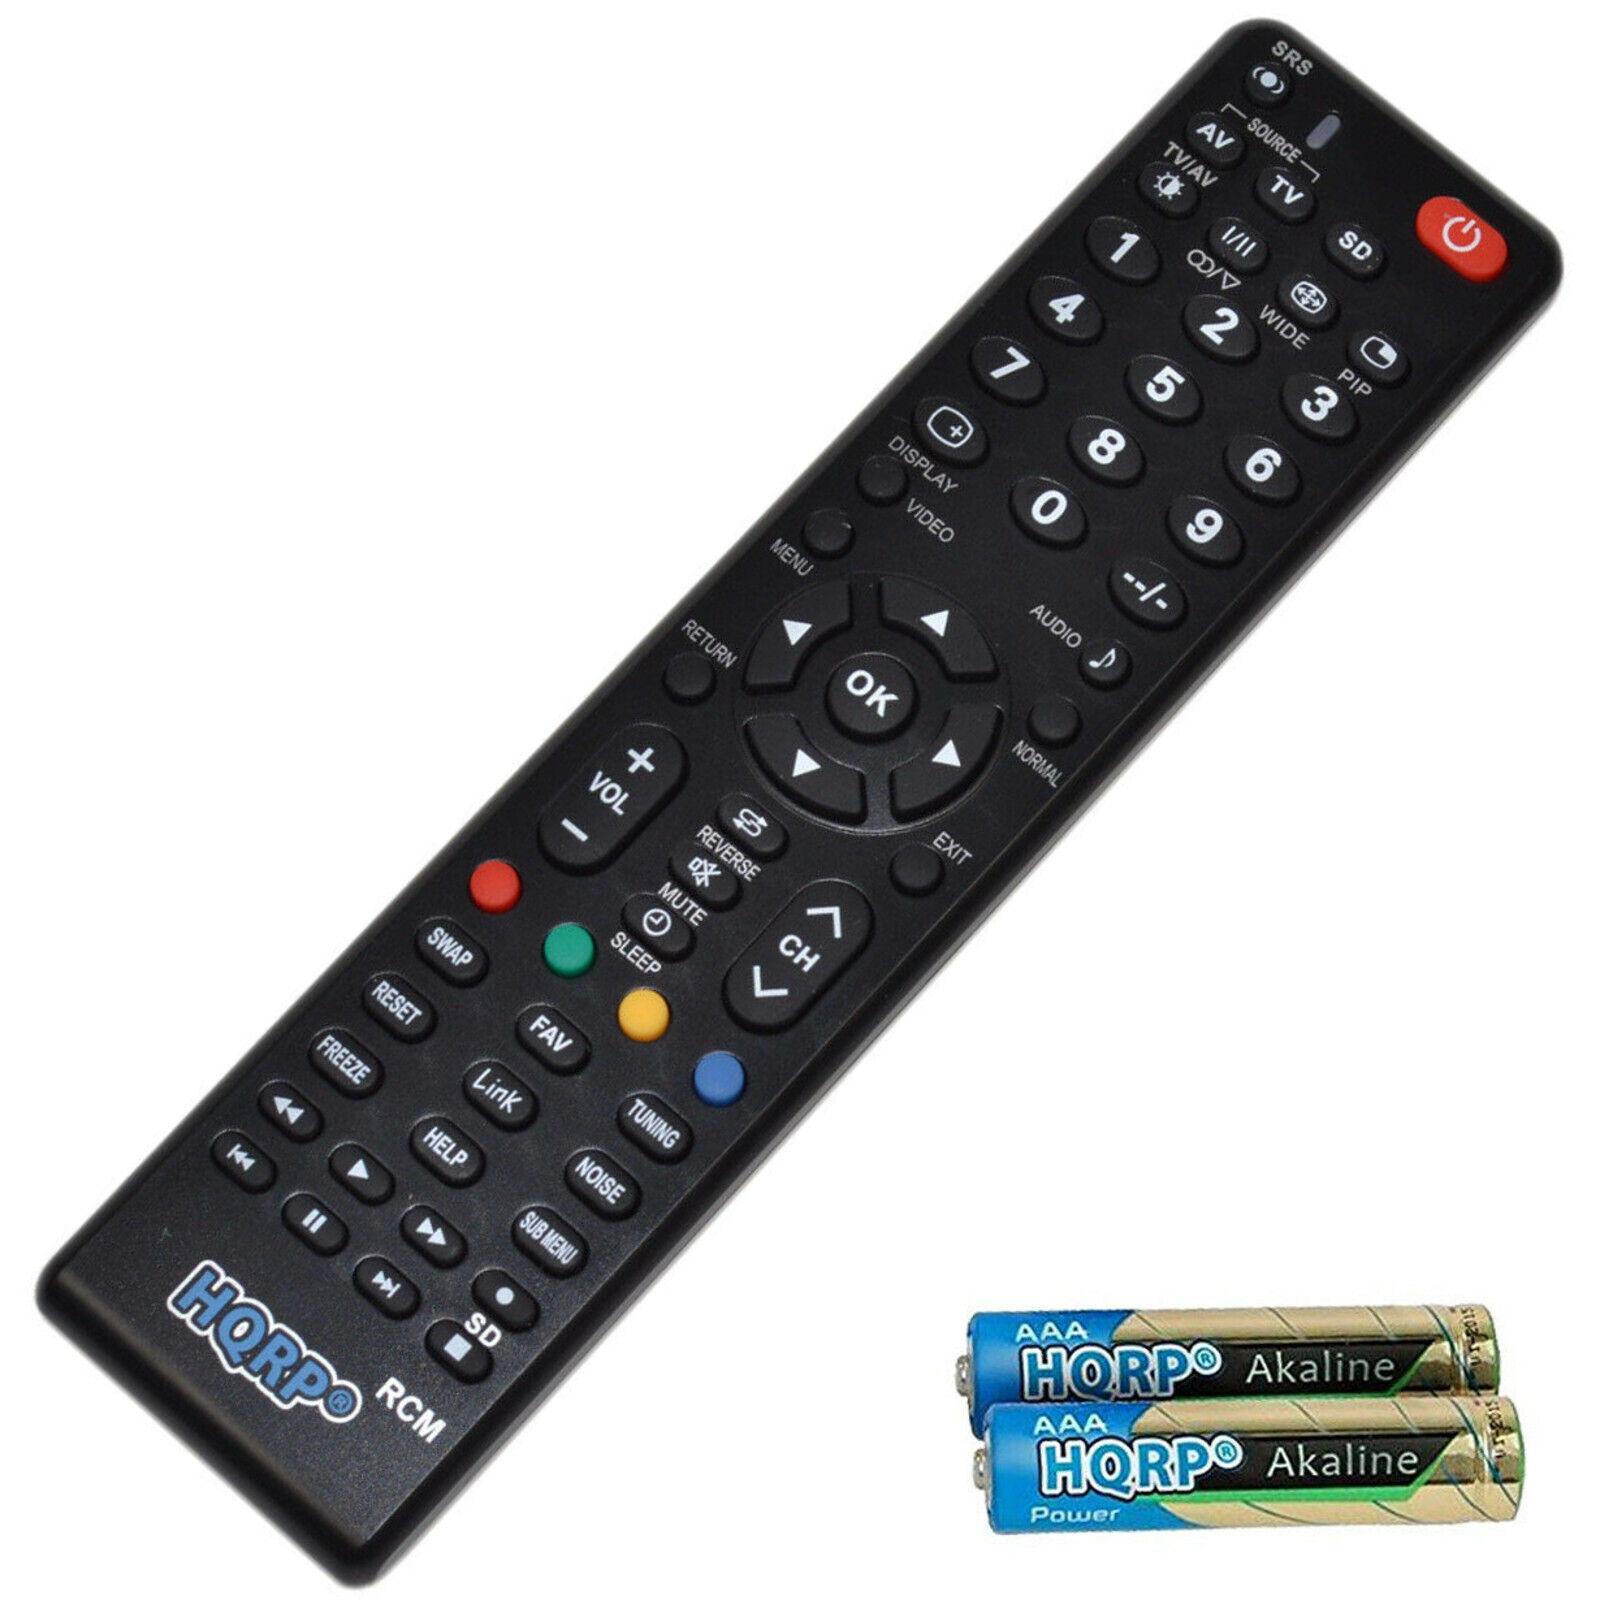 HQRP Remote Control for Panasonic PT TC TH TX Series LCD LED